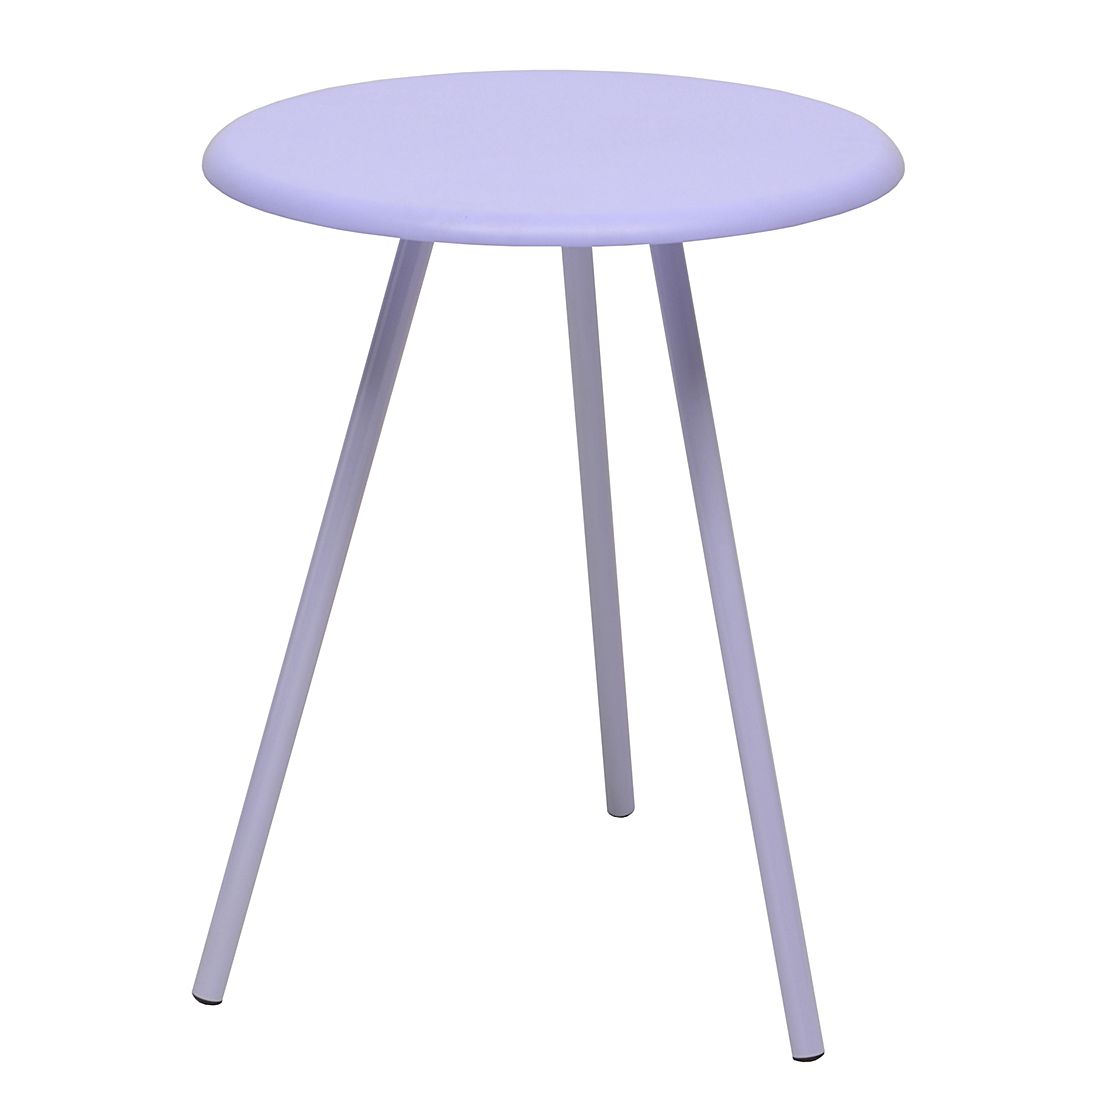 Tavolino Avellan I - Lilla, reconcept